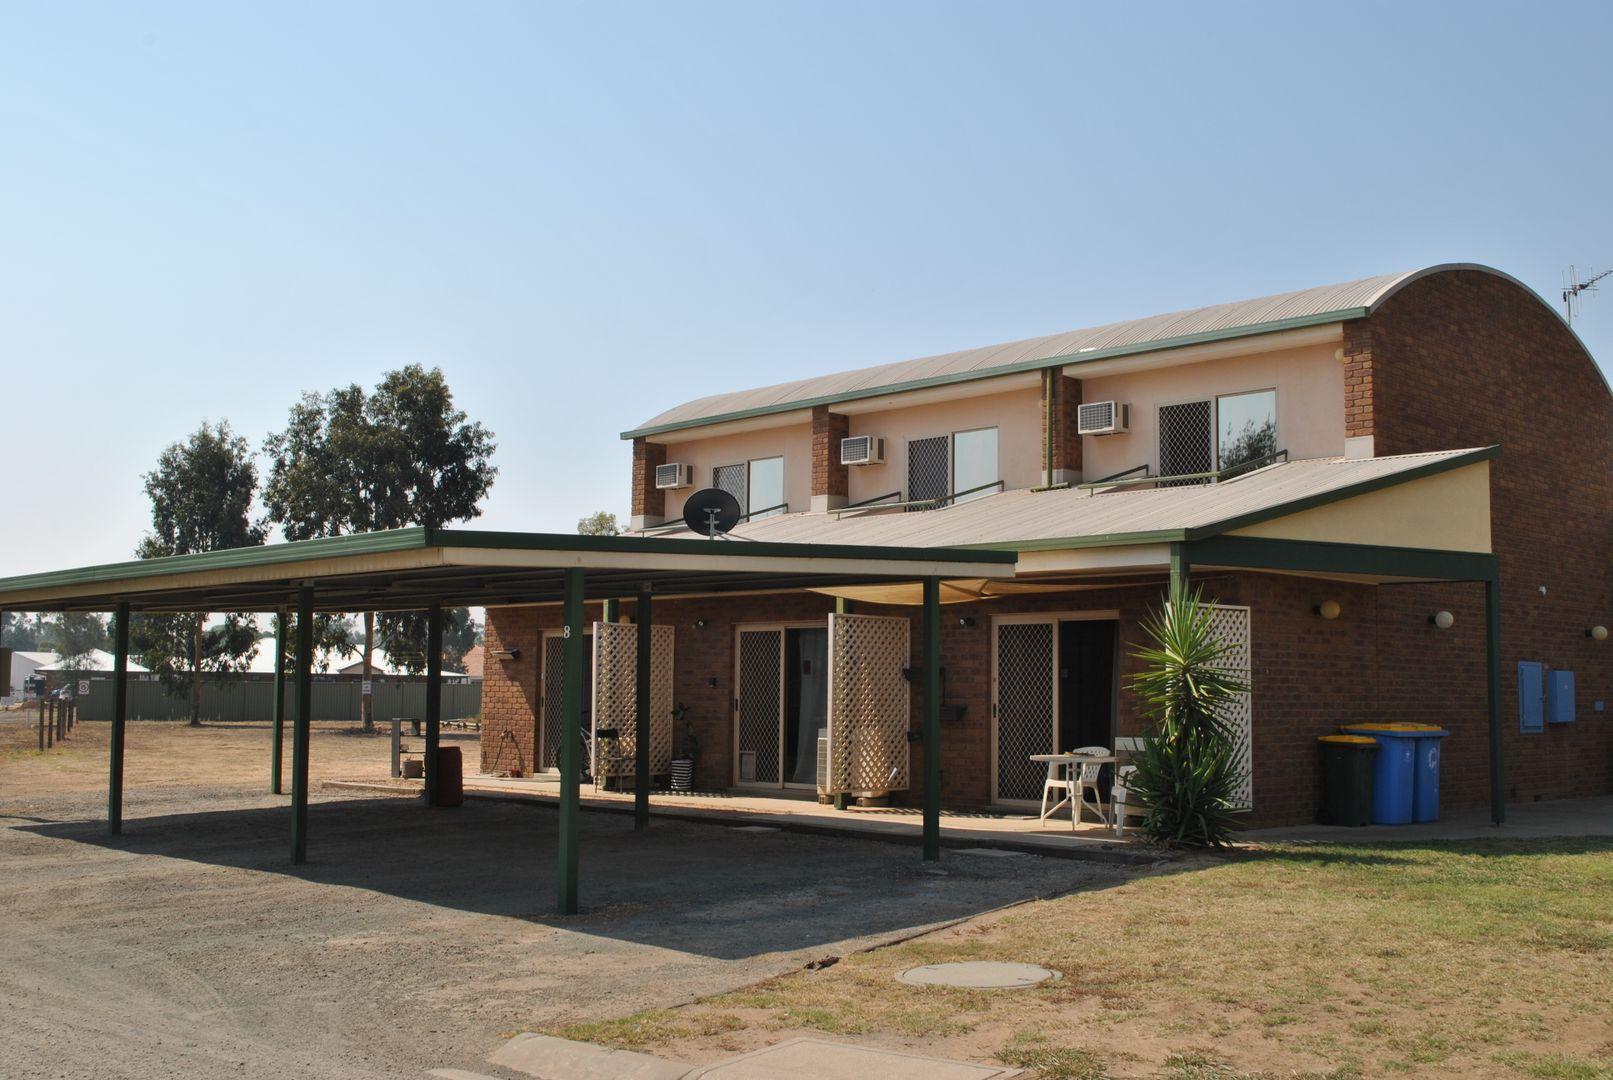 9/128 Murray Valley Highway, Yarrawonga VIC 3730, Image 0